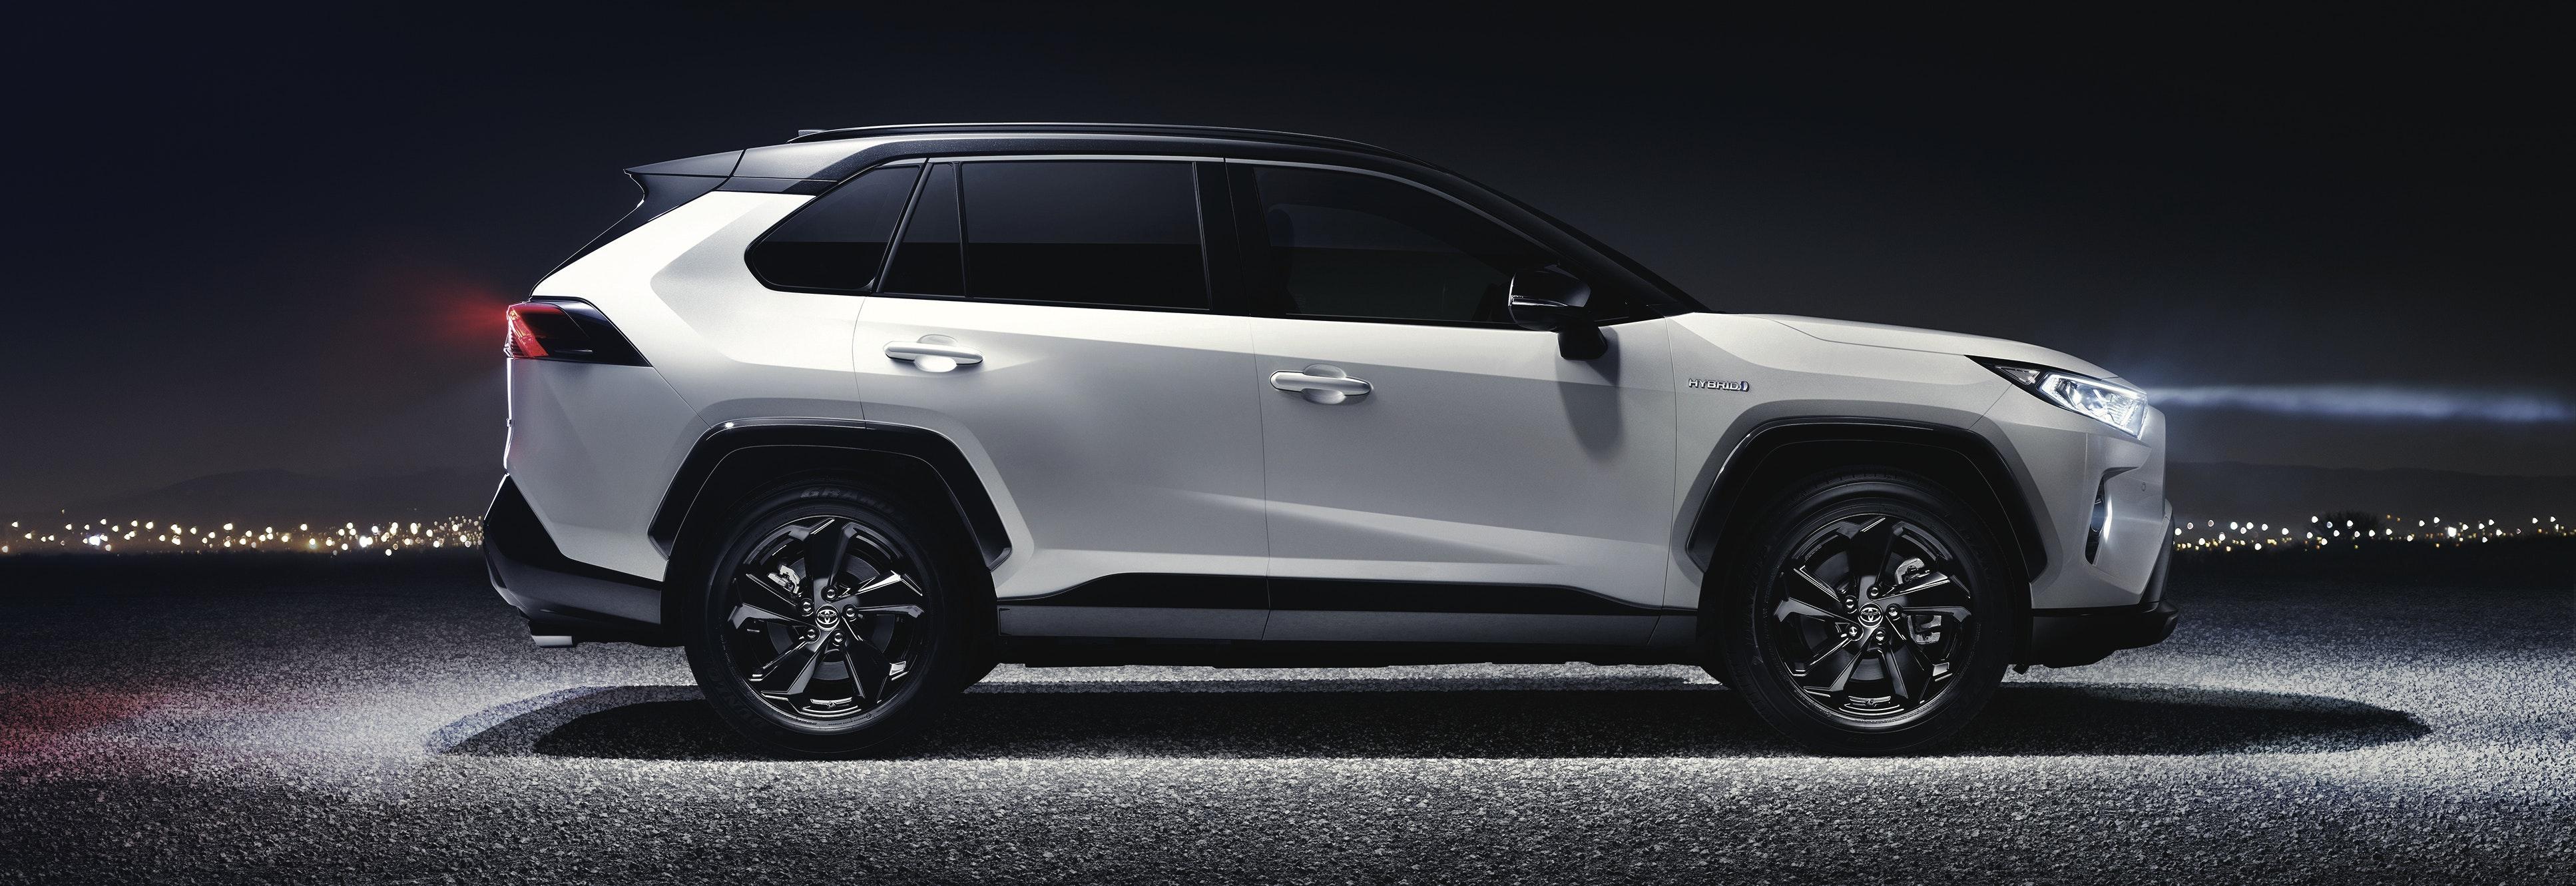 Honda Suv Canada U003eu003e 2019 Toyota RAV4 Price, Specs, And Release Date  